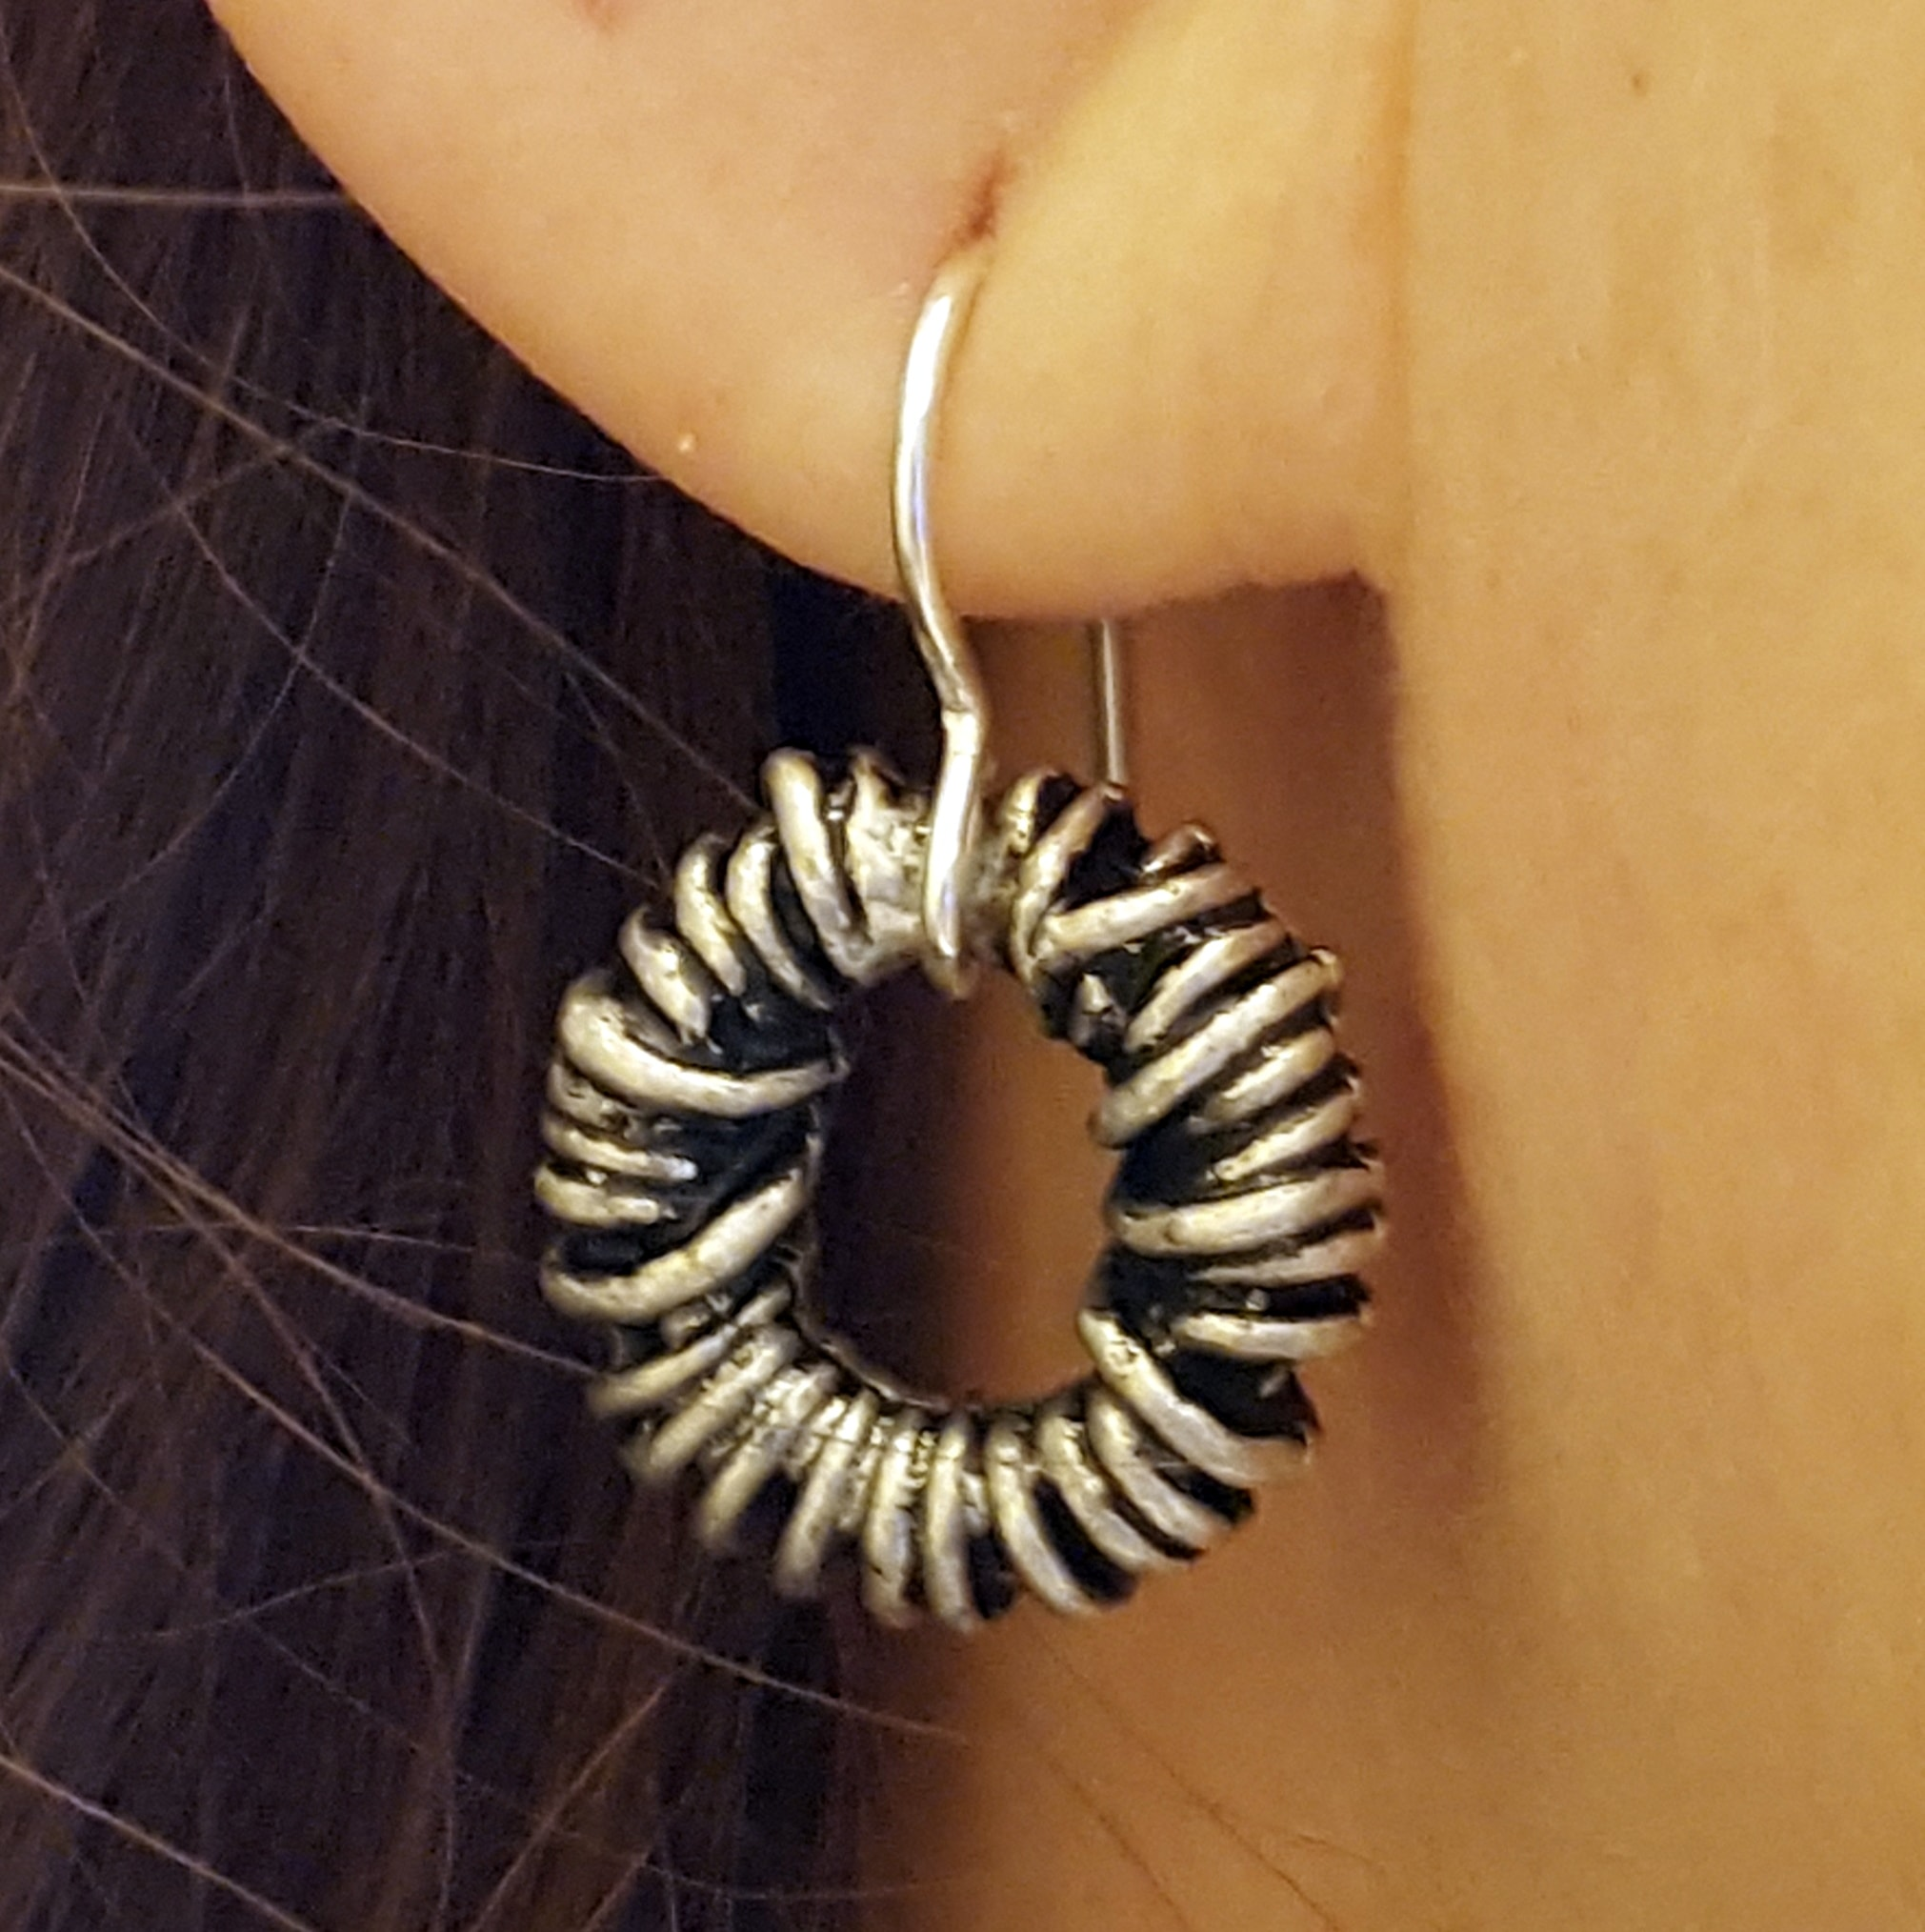 silver twisted earring on model